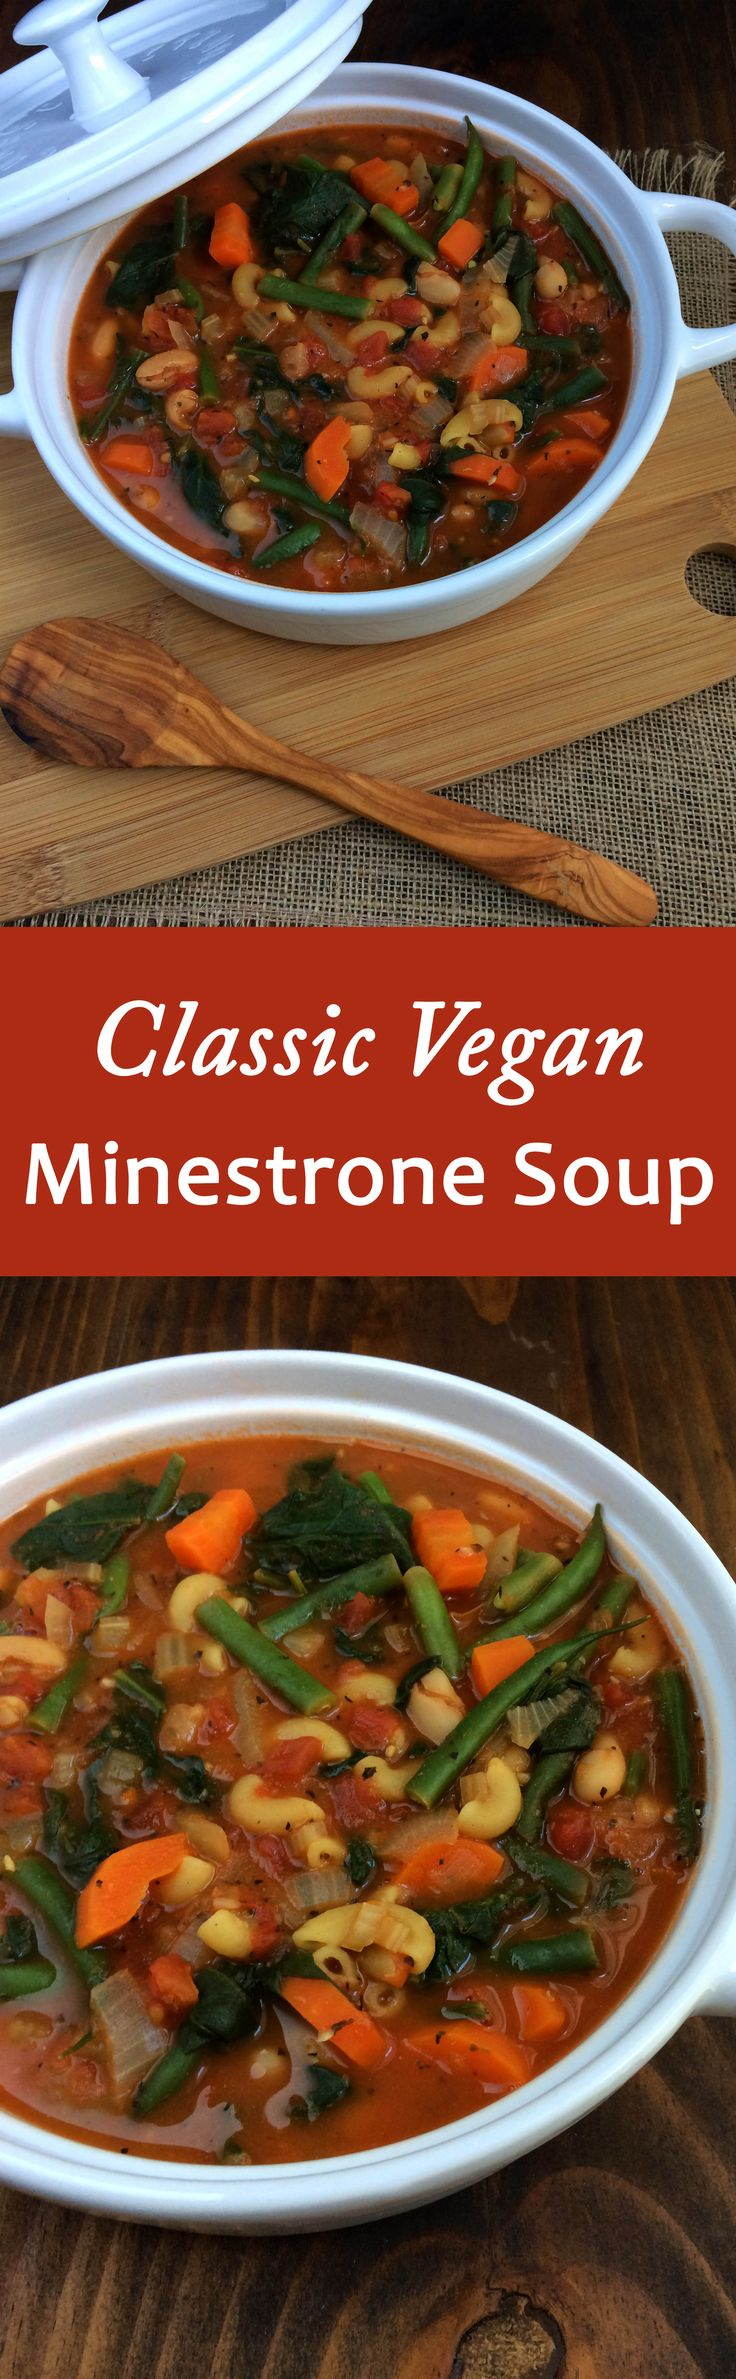 Classic Vegan Minestrone Soup Recipe